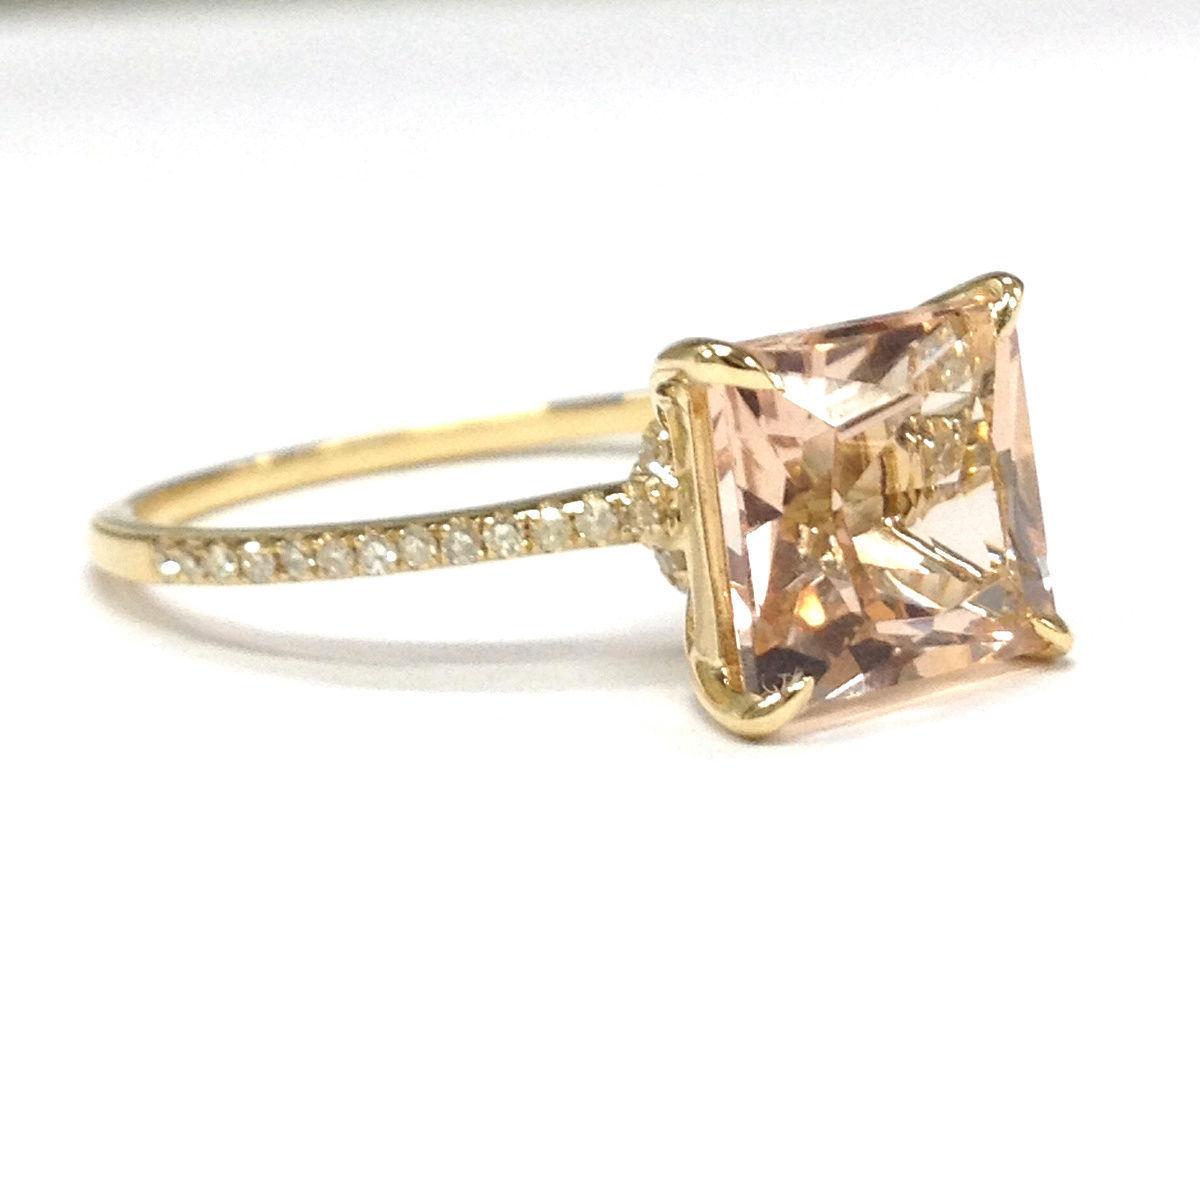 8mm princess cut morganite diamonds 14k yellow gold